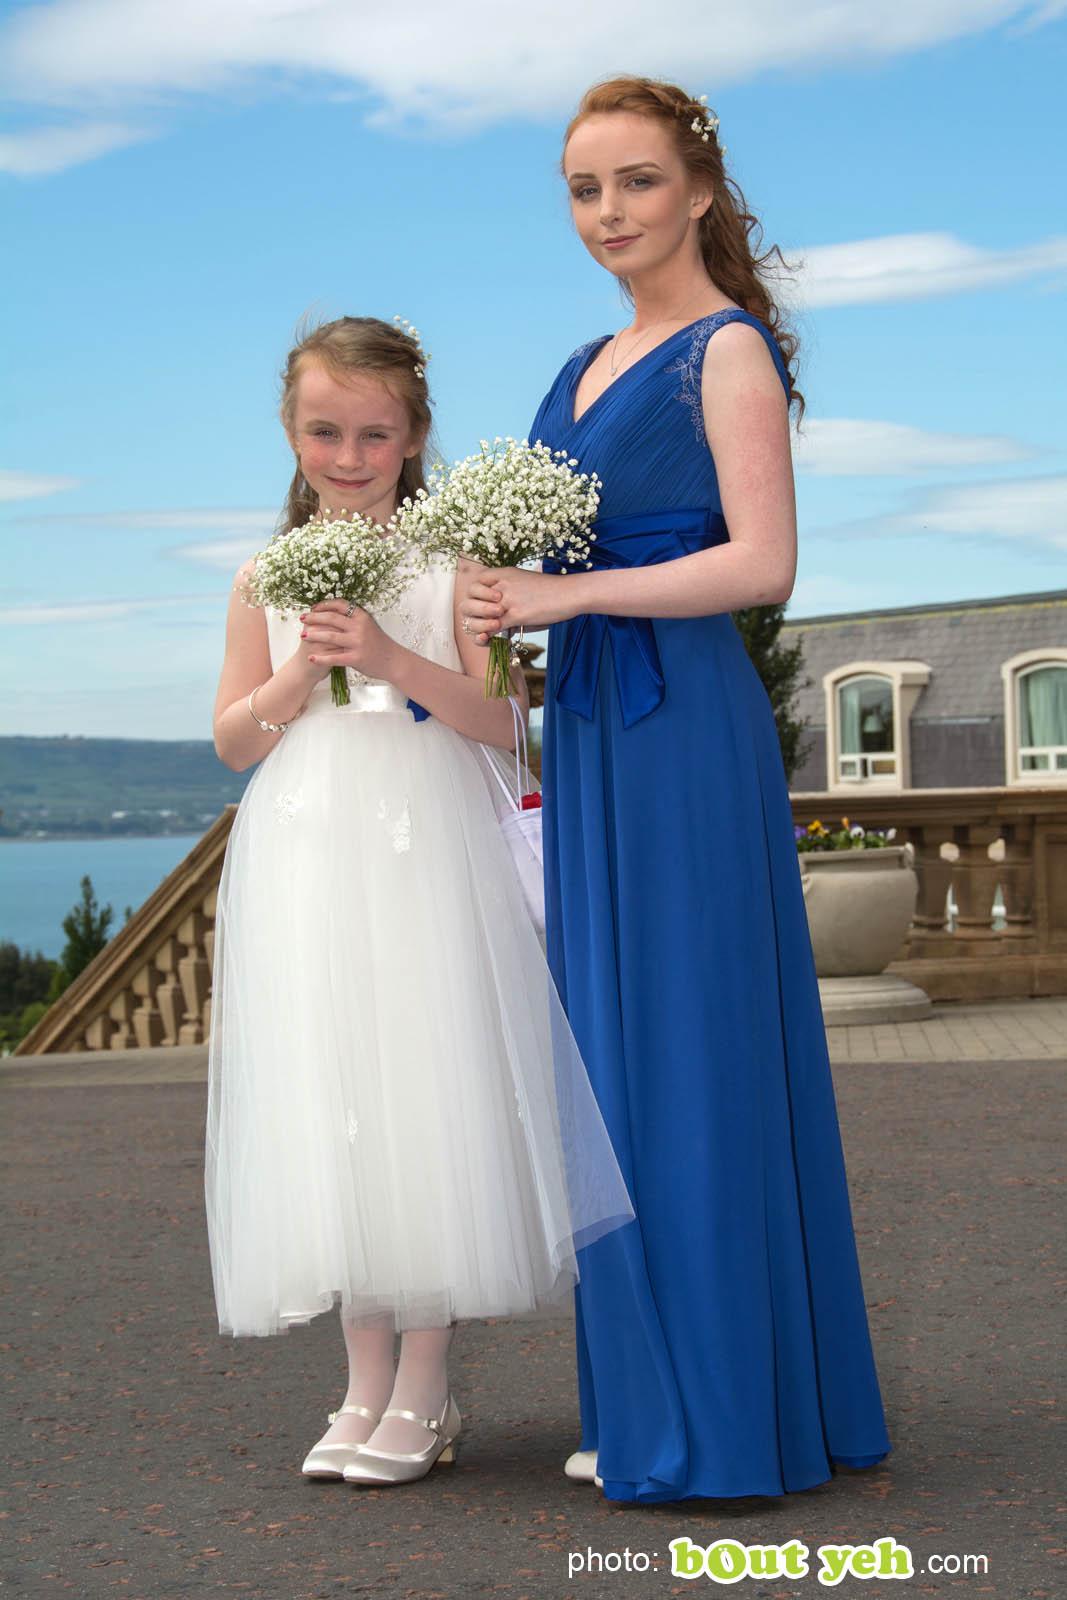 Wedding photographer Belfast Northern Ireland - Wedding photography portfolio photo 5877